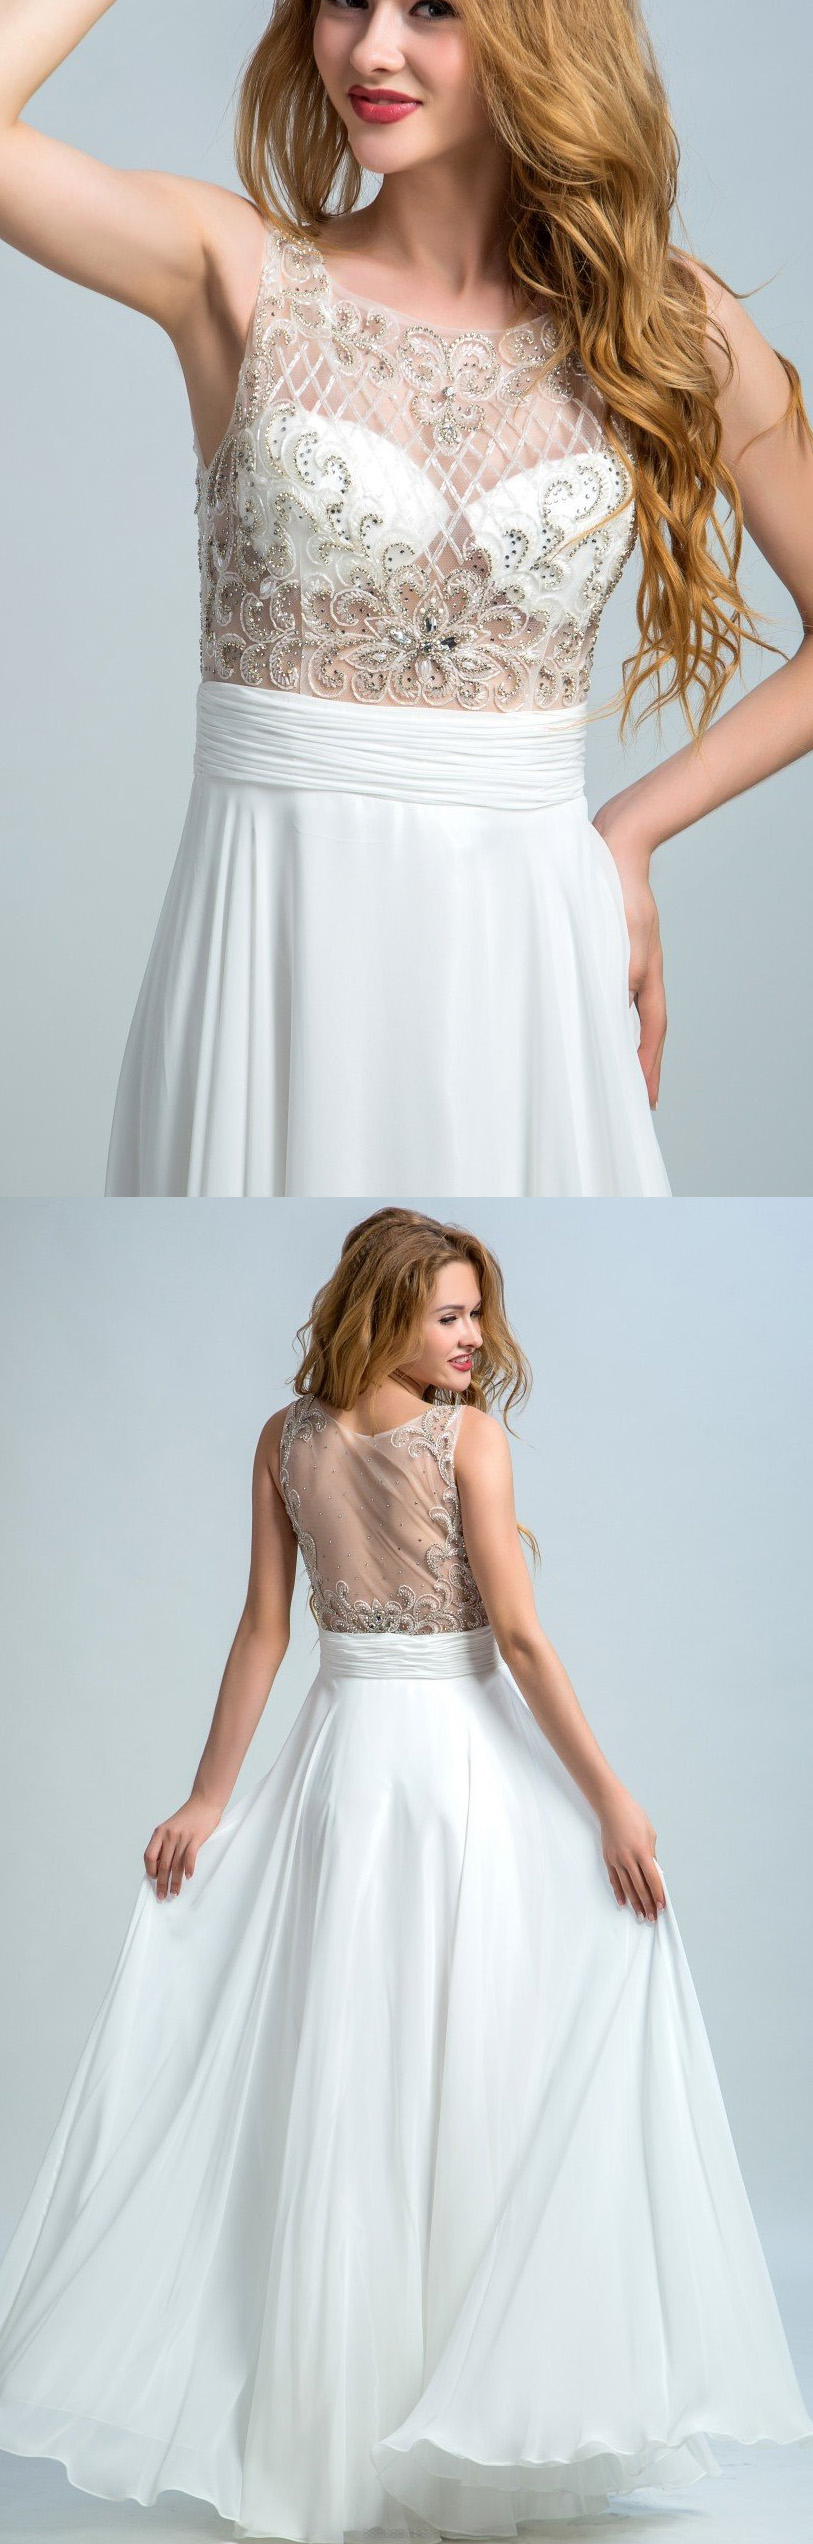 White prom dresses long prom dresses sleeveless evening dresses